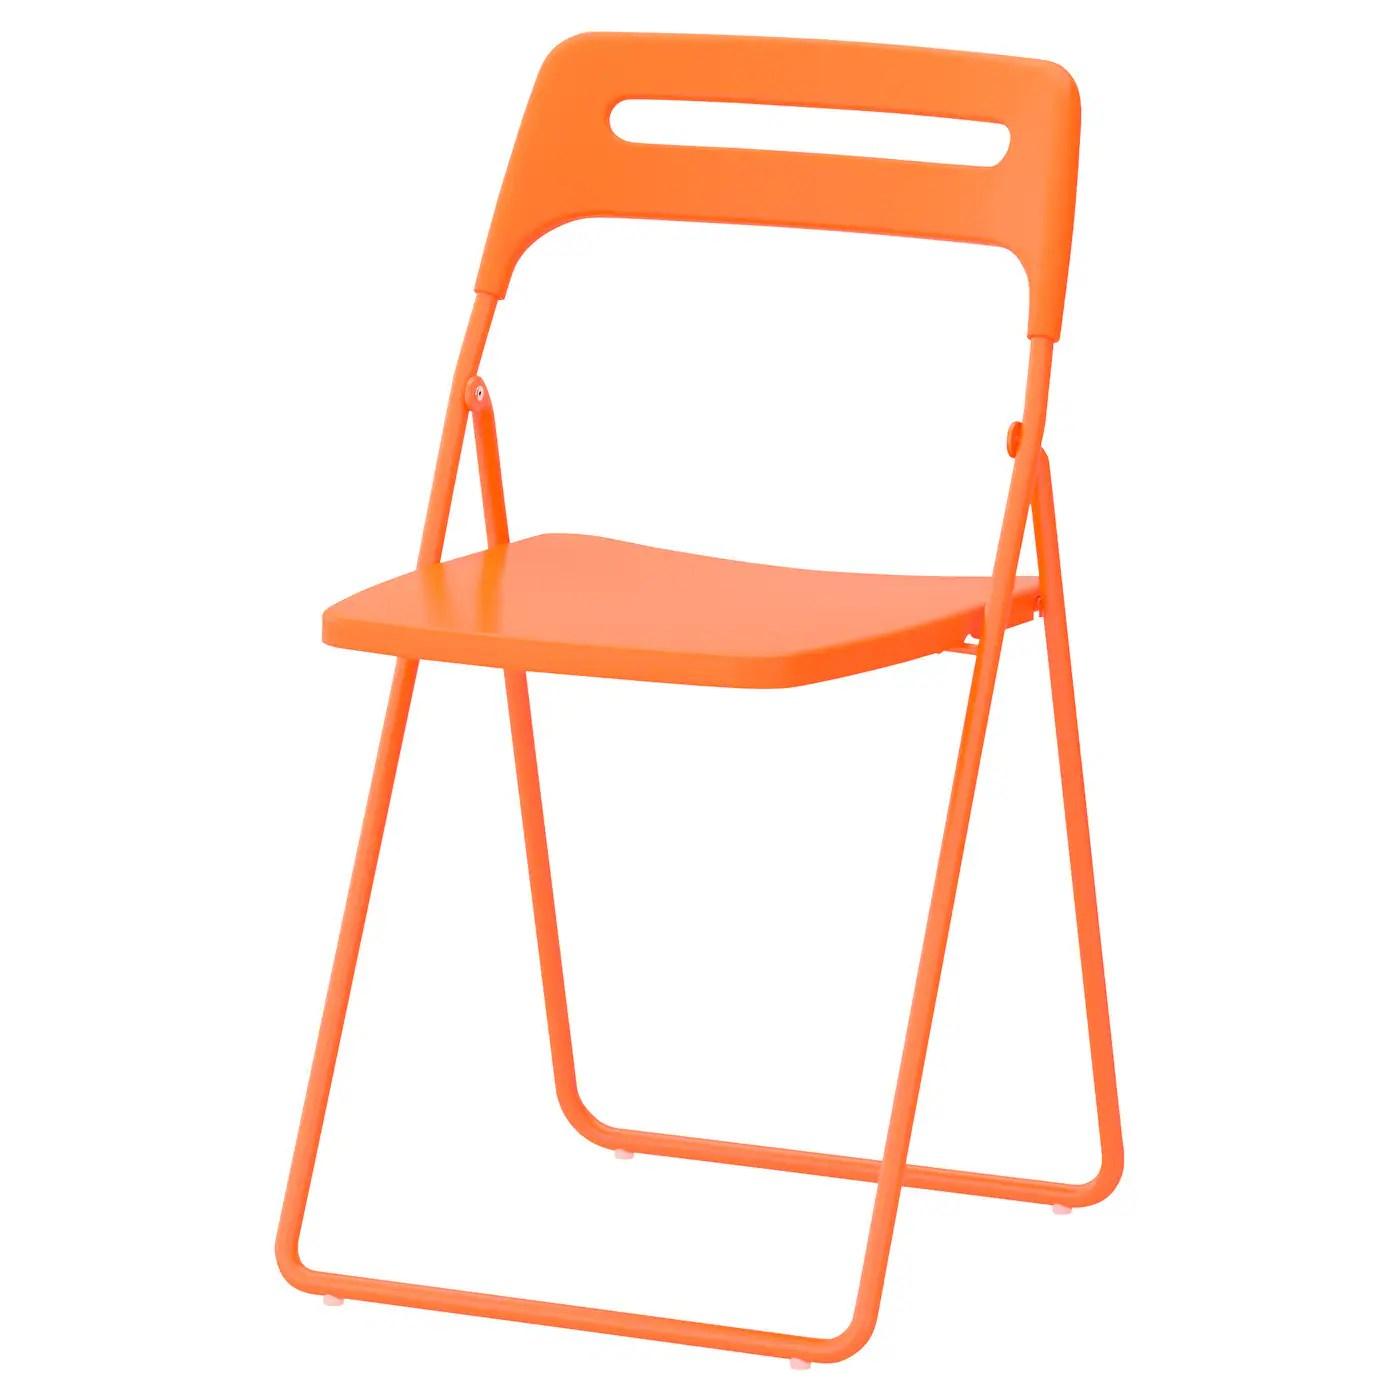 high end folding chairs clamp on chair sun umbrella nisse orange ikea